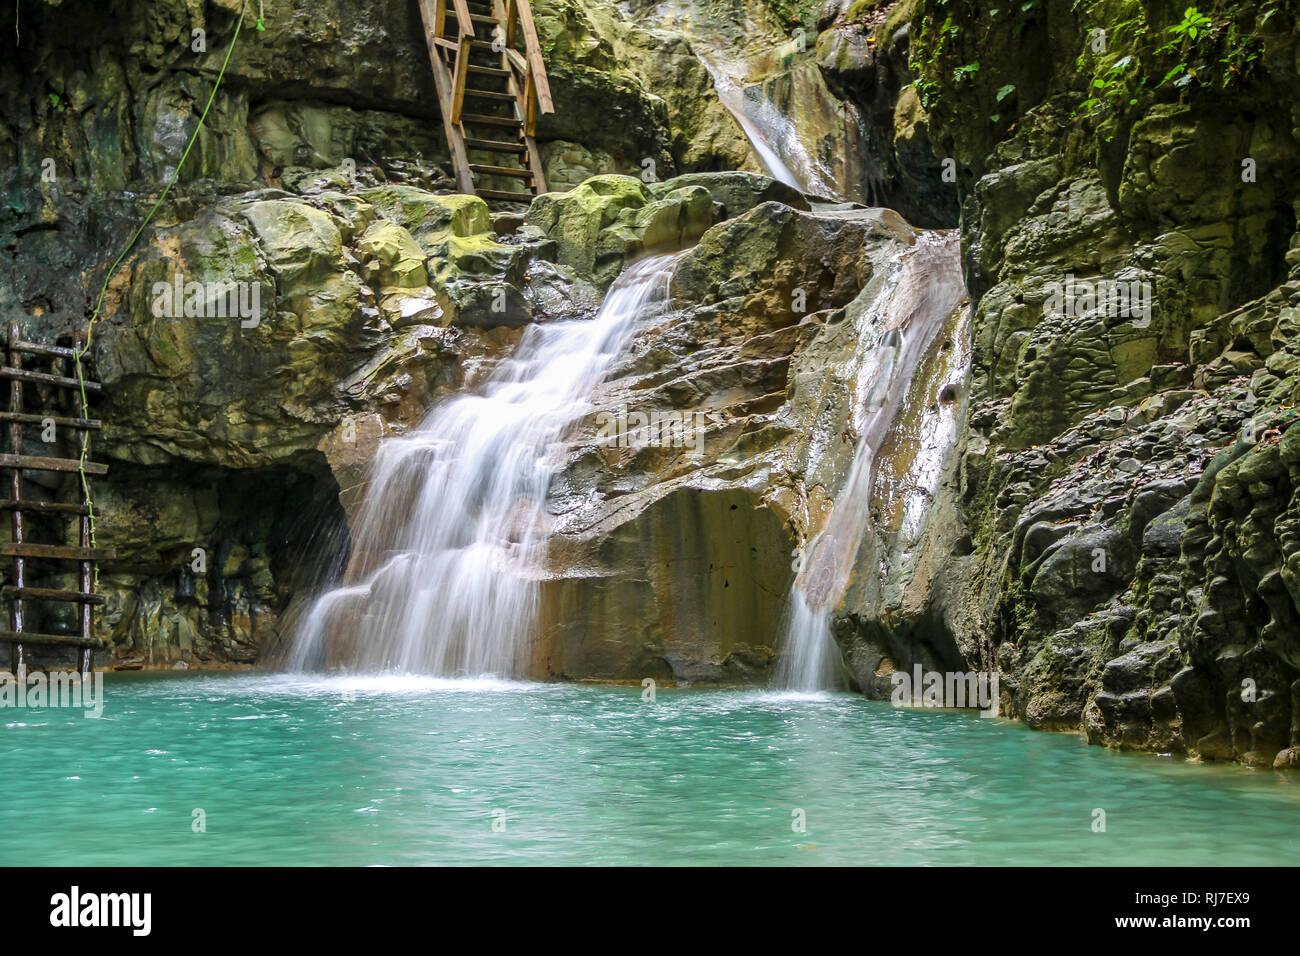 Große Antillen, Karibik, Dominikanische Republik, Imbert, Naturjuwel 27 Charcos de Damajagua Stockfoto